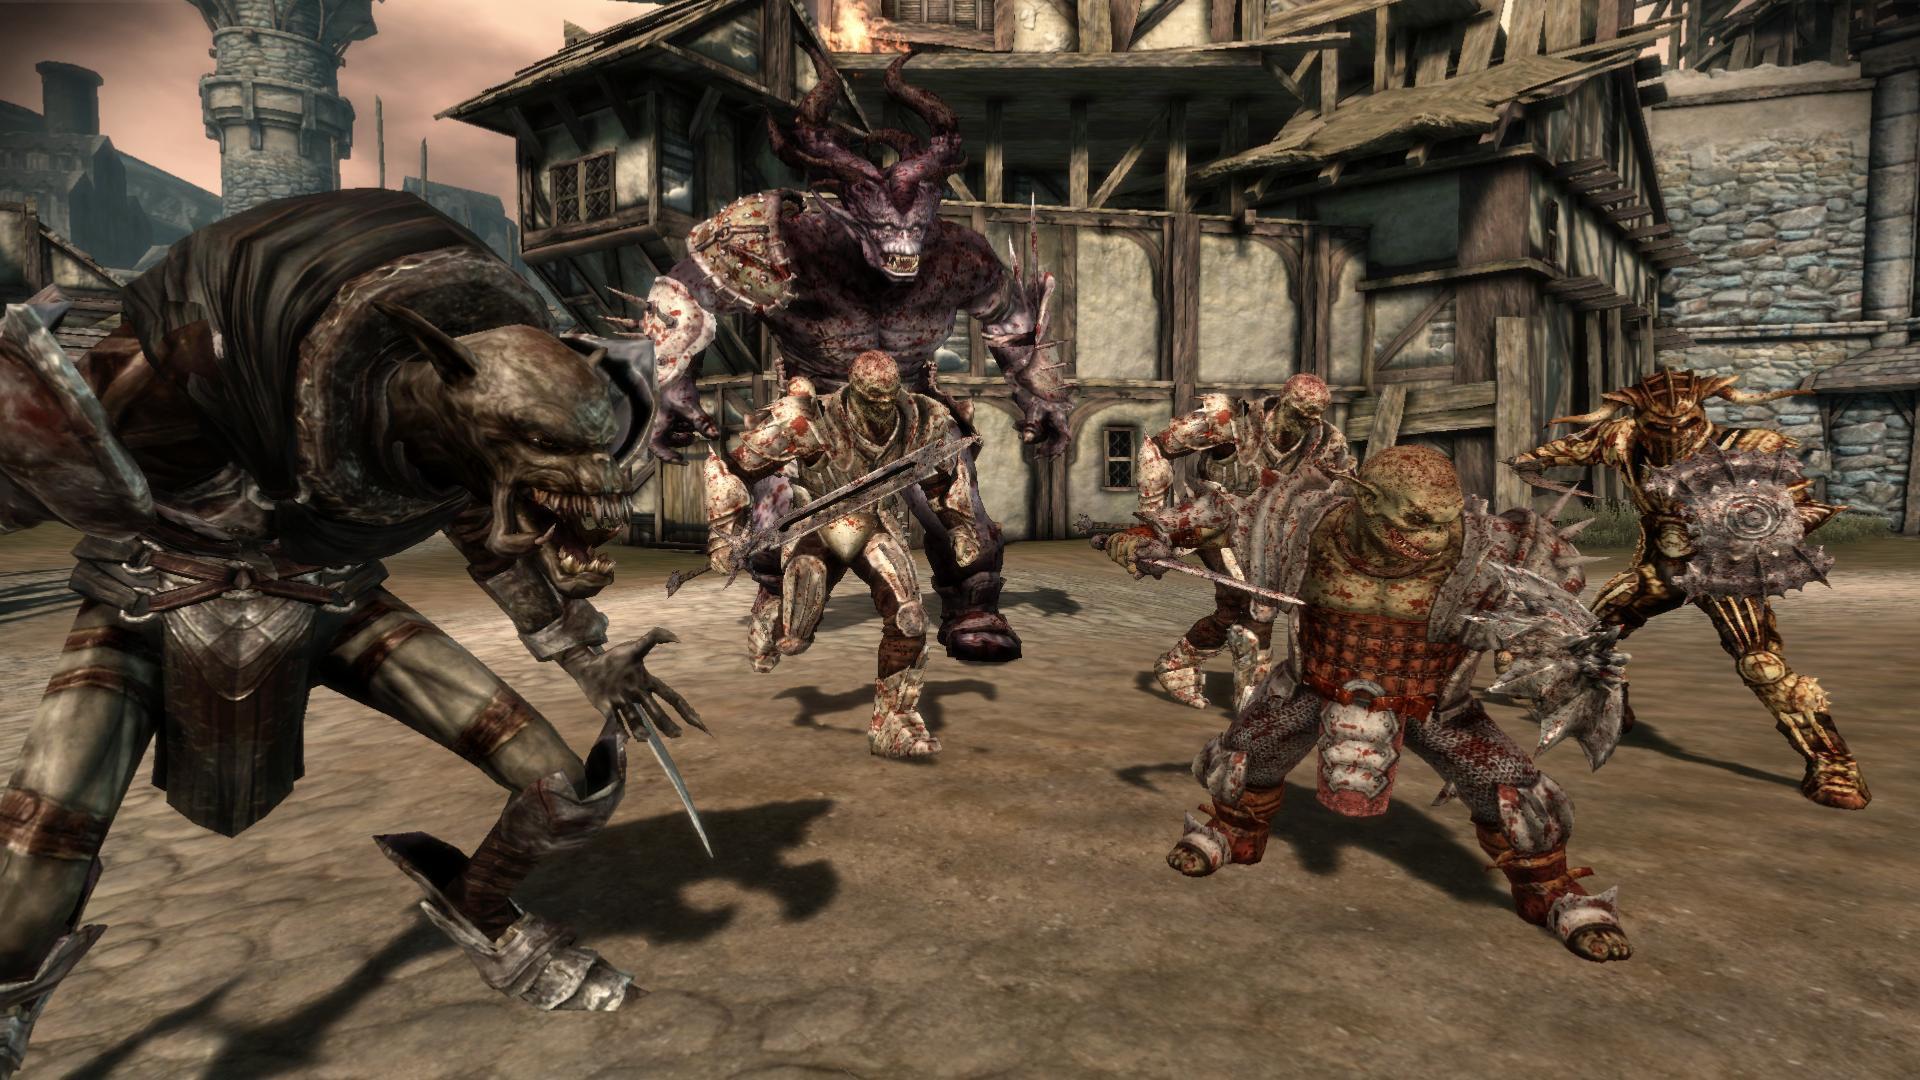 Dragon Age: Origins - Screenshots di Darkspawn